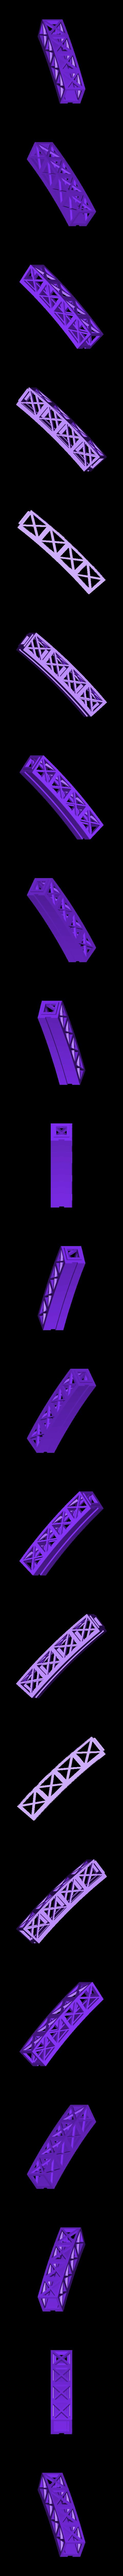 SEG_S-4.stl Download free STL file LED bridge lamp • Model to 3D print, Opossums